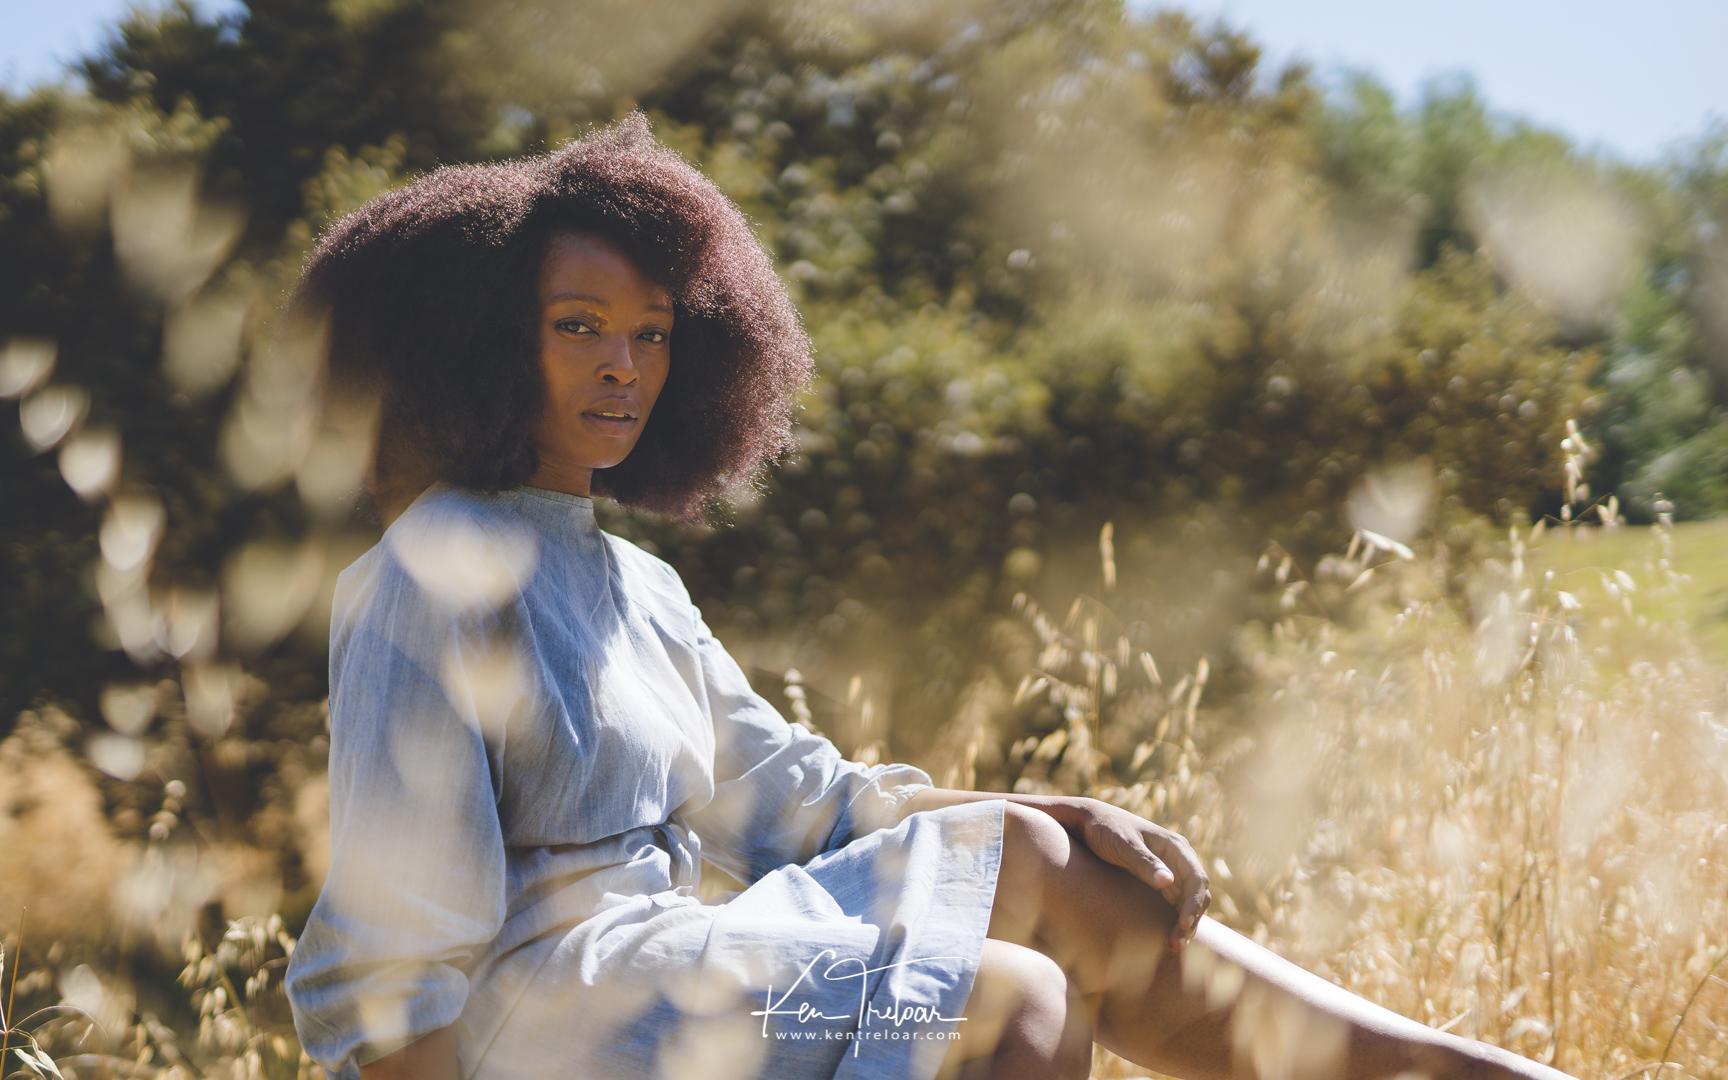 Ken Treloar Photography - Natural L-ight Editorial Portrait Fashion Photo Session - Cape Town Dec 2018-9.jpg